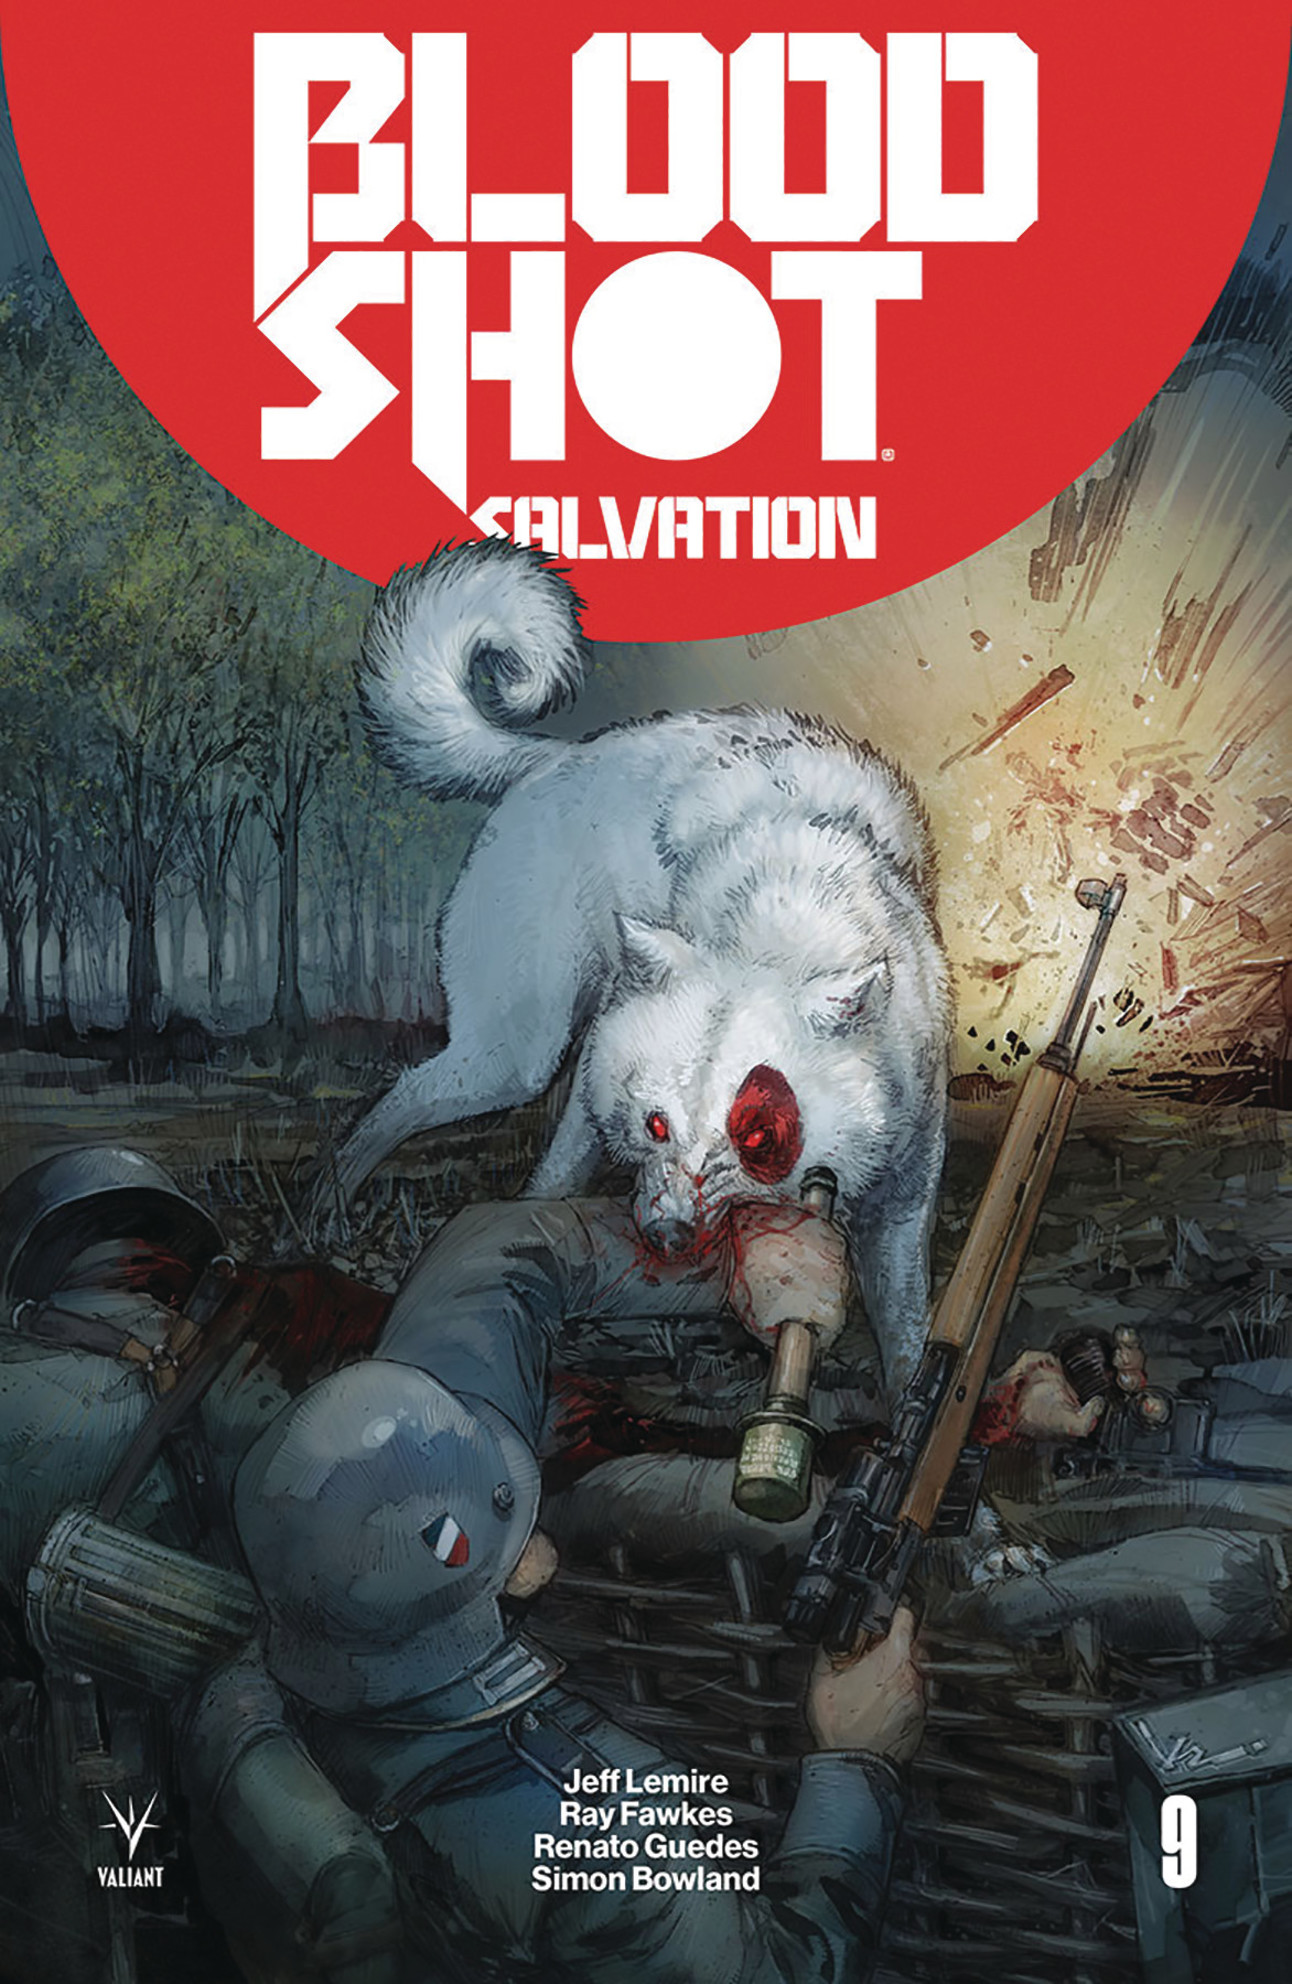 valiant_bloodshot_salvation_7.jpg